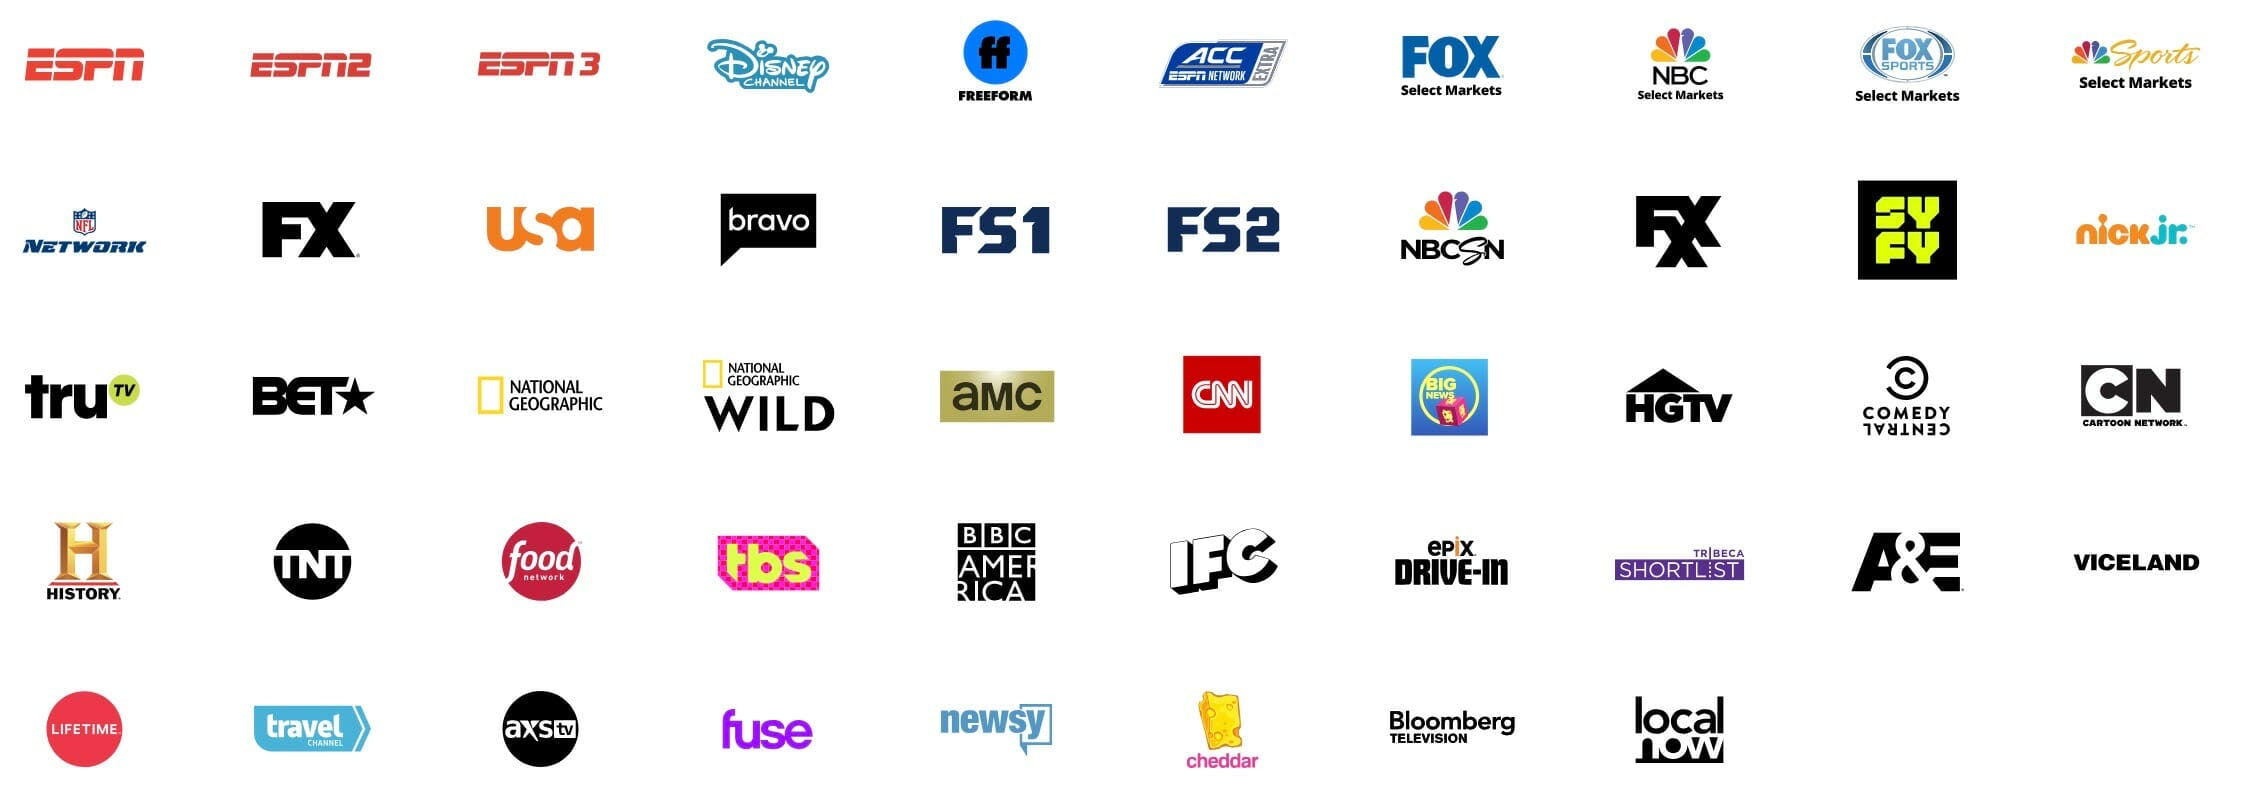 watch 2018 world series live stream sling tv channels